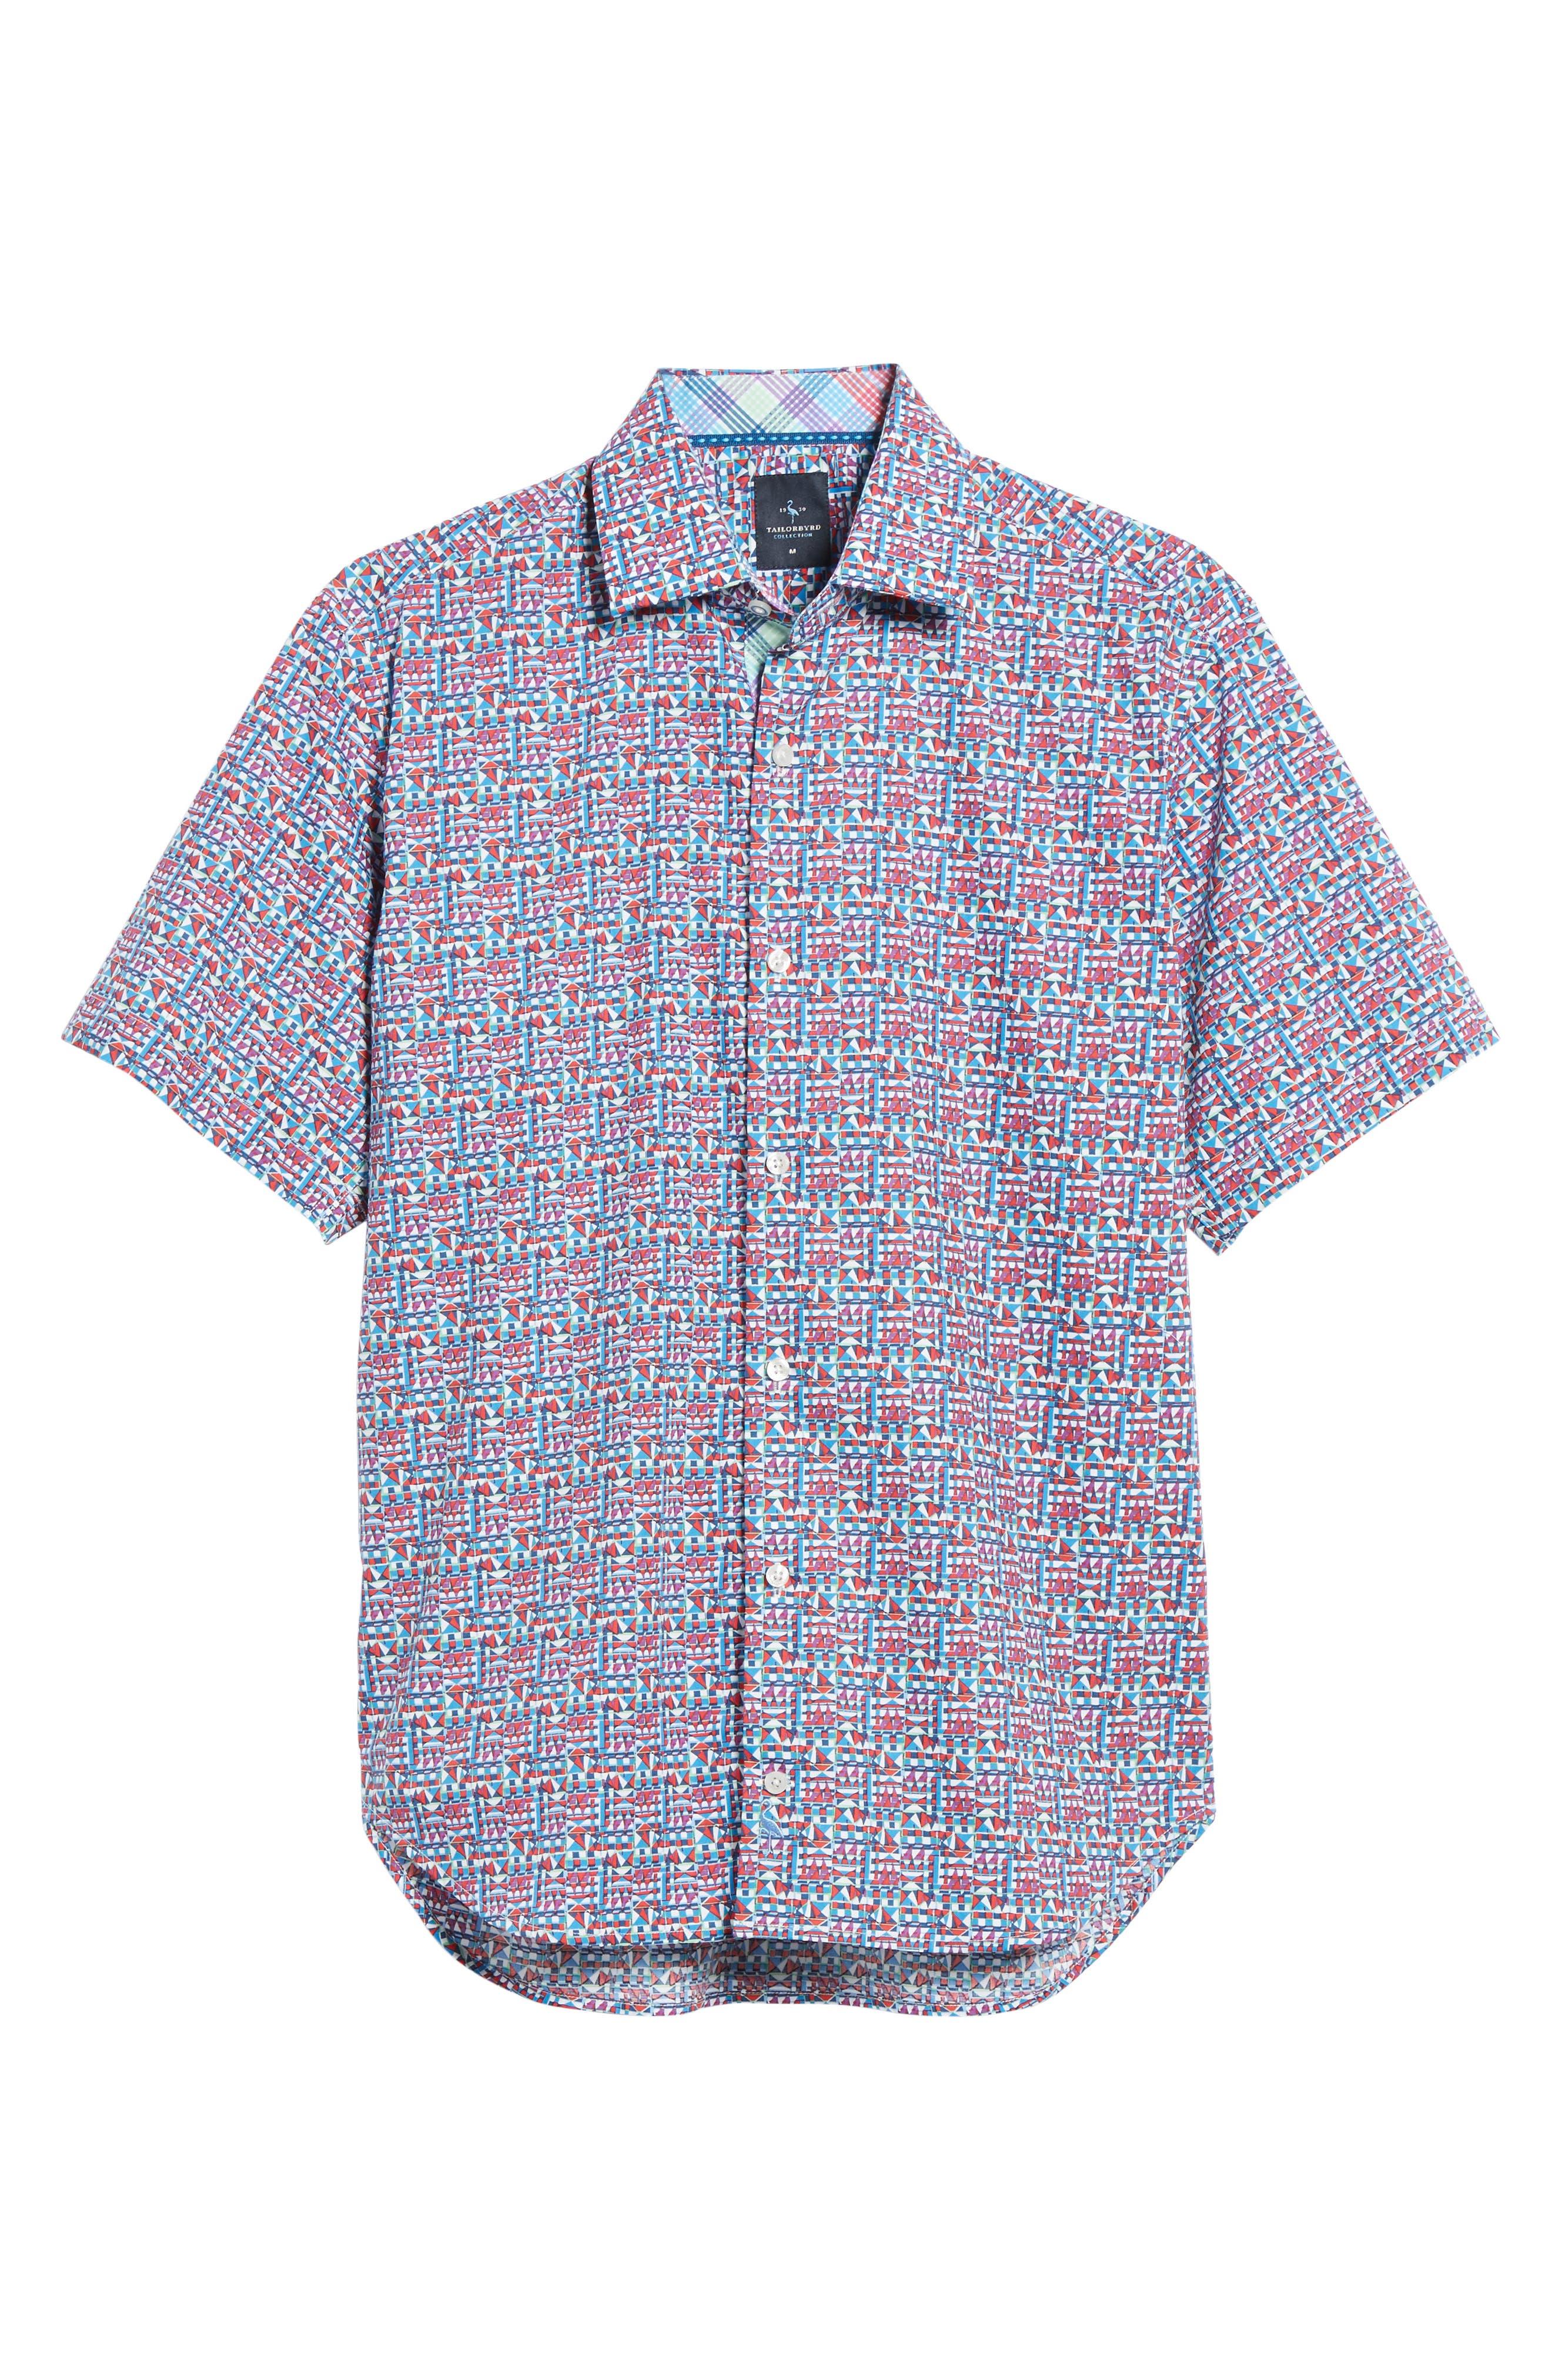 Maurice Print Sport Shirt,                             Alternate thumbnail 6, color,                             950